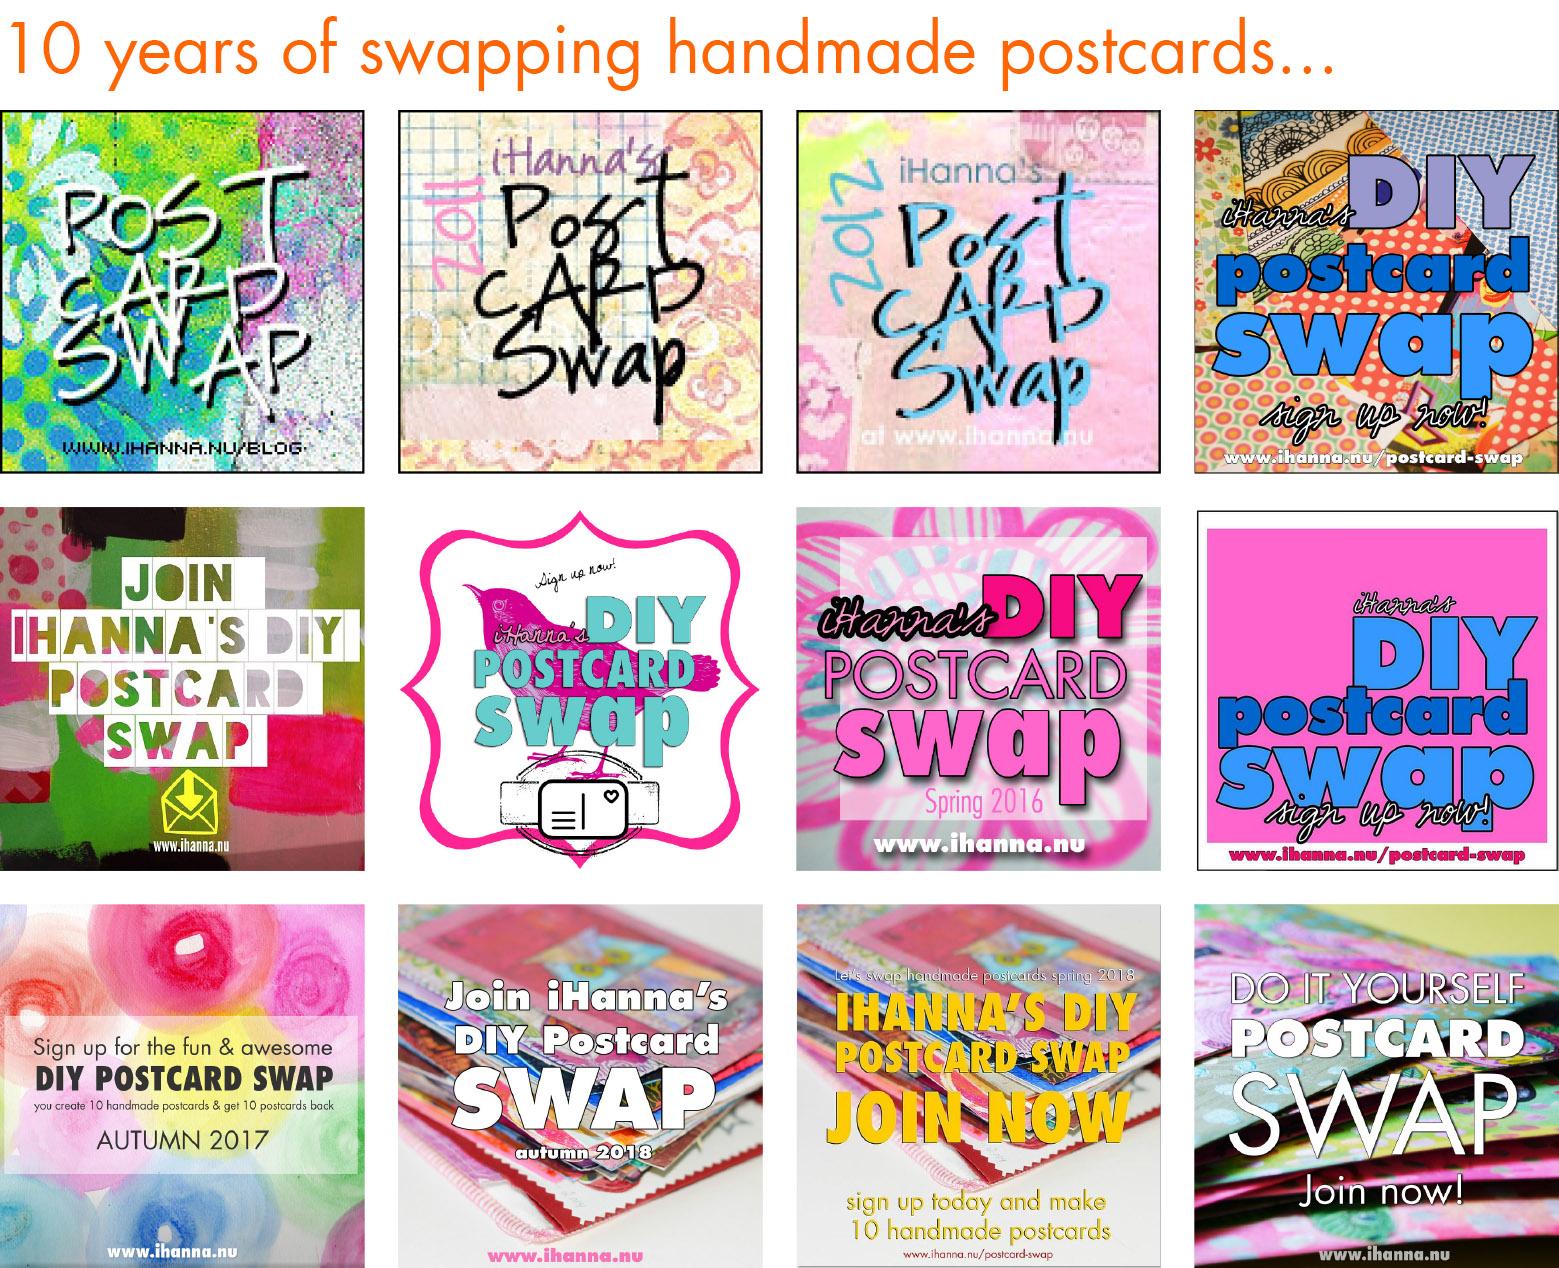 10 years anniversary of the DIY Postcard Swap #diyPostcardSwap